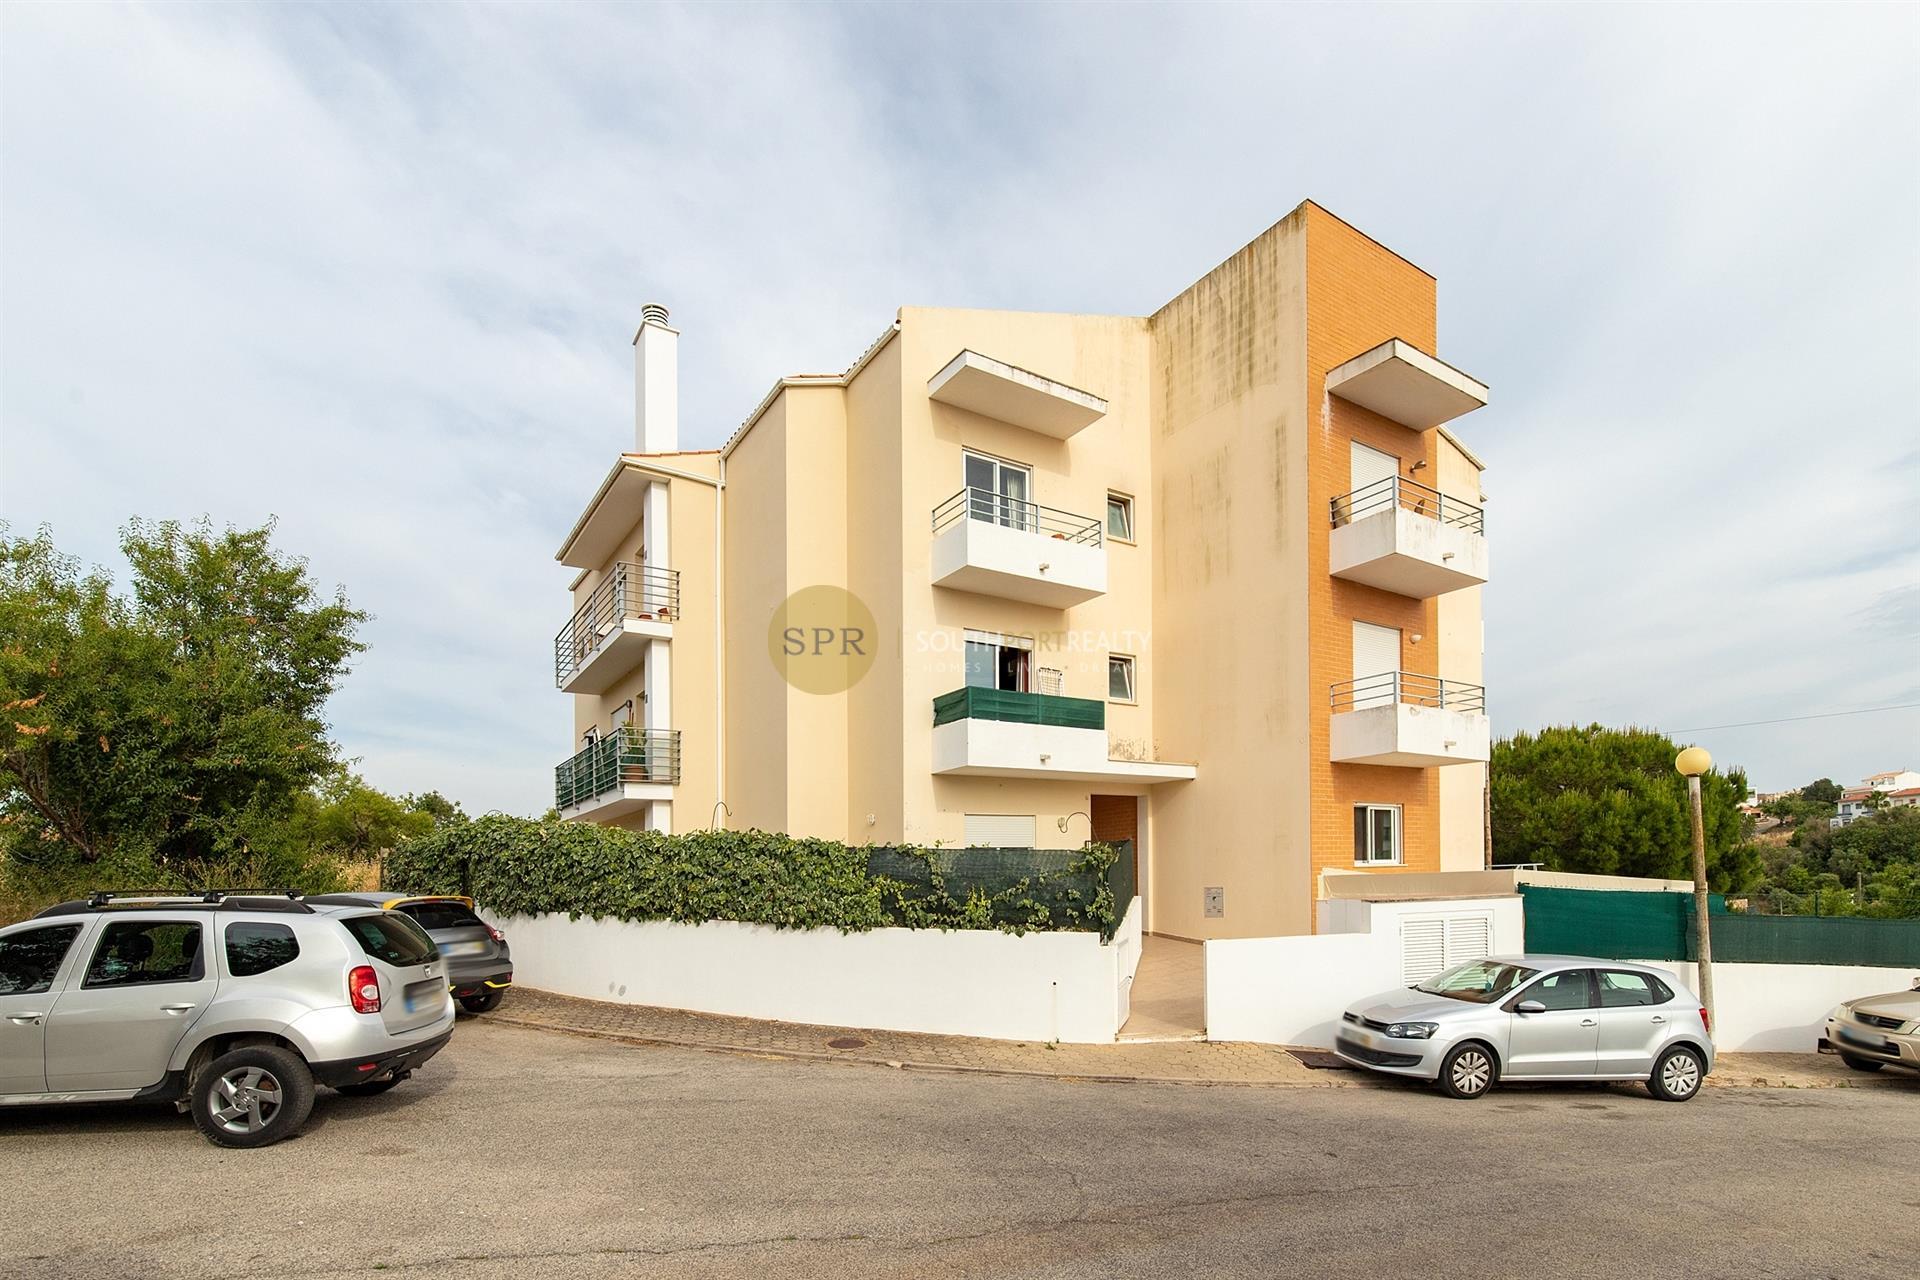 3 bedroom apartment for sale Ferragudo